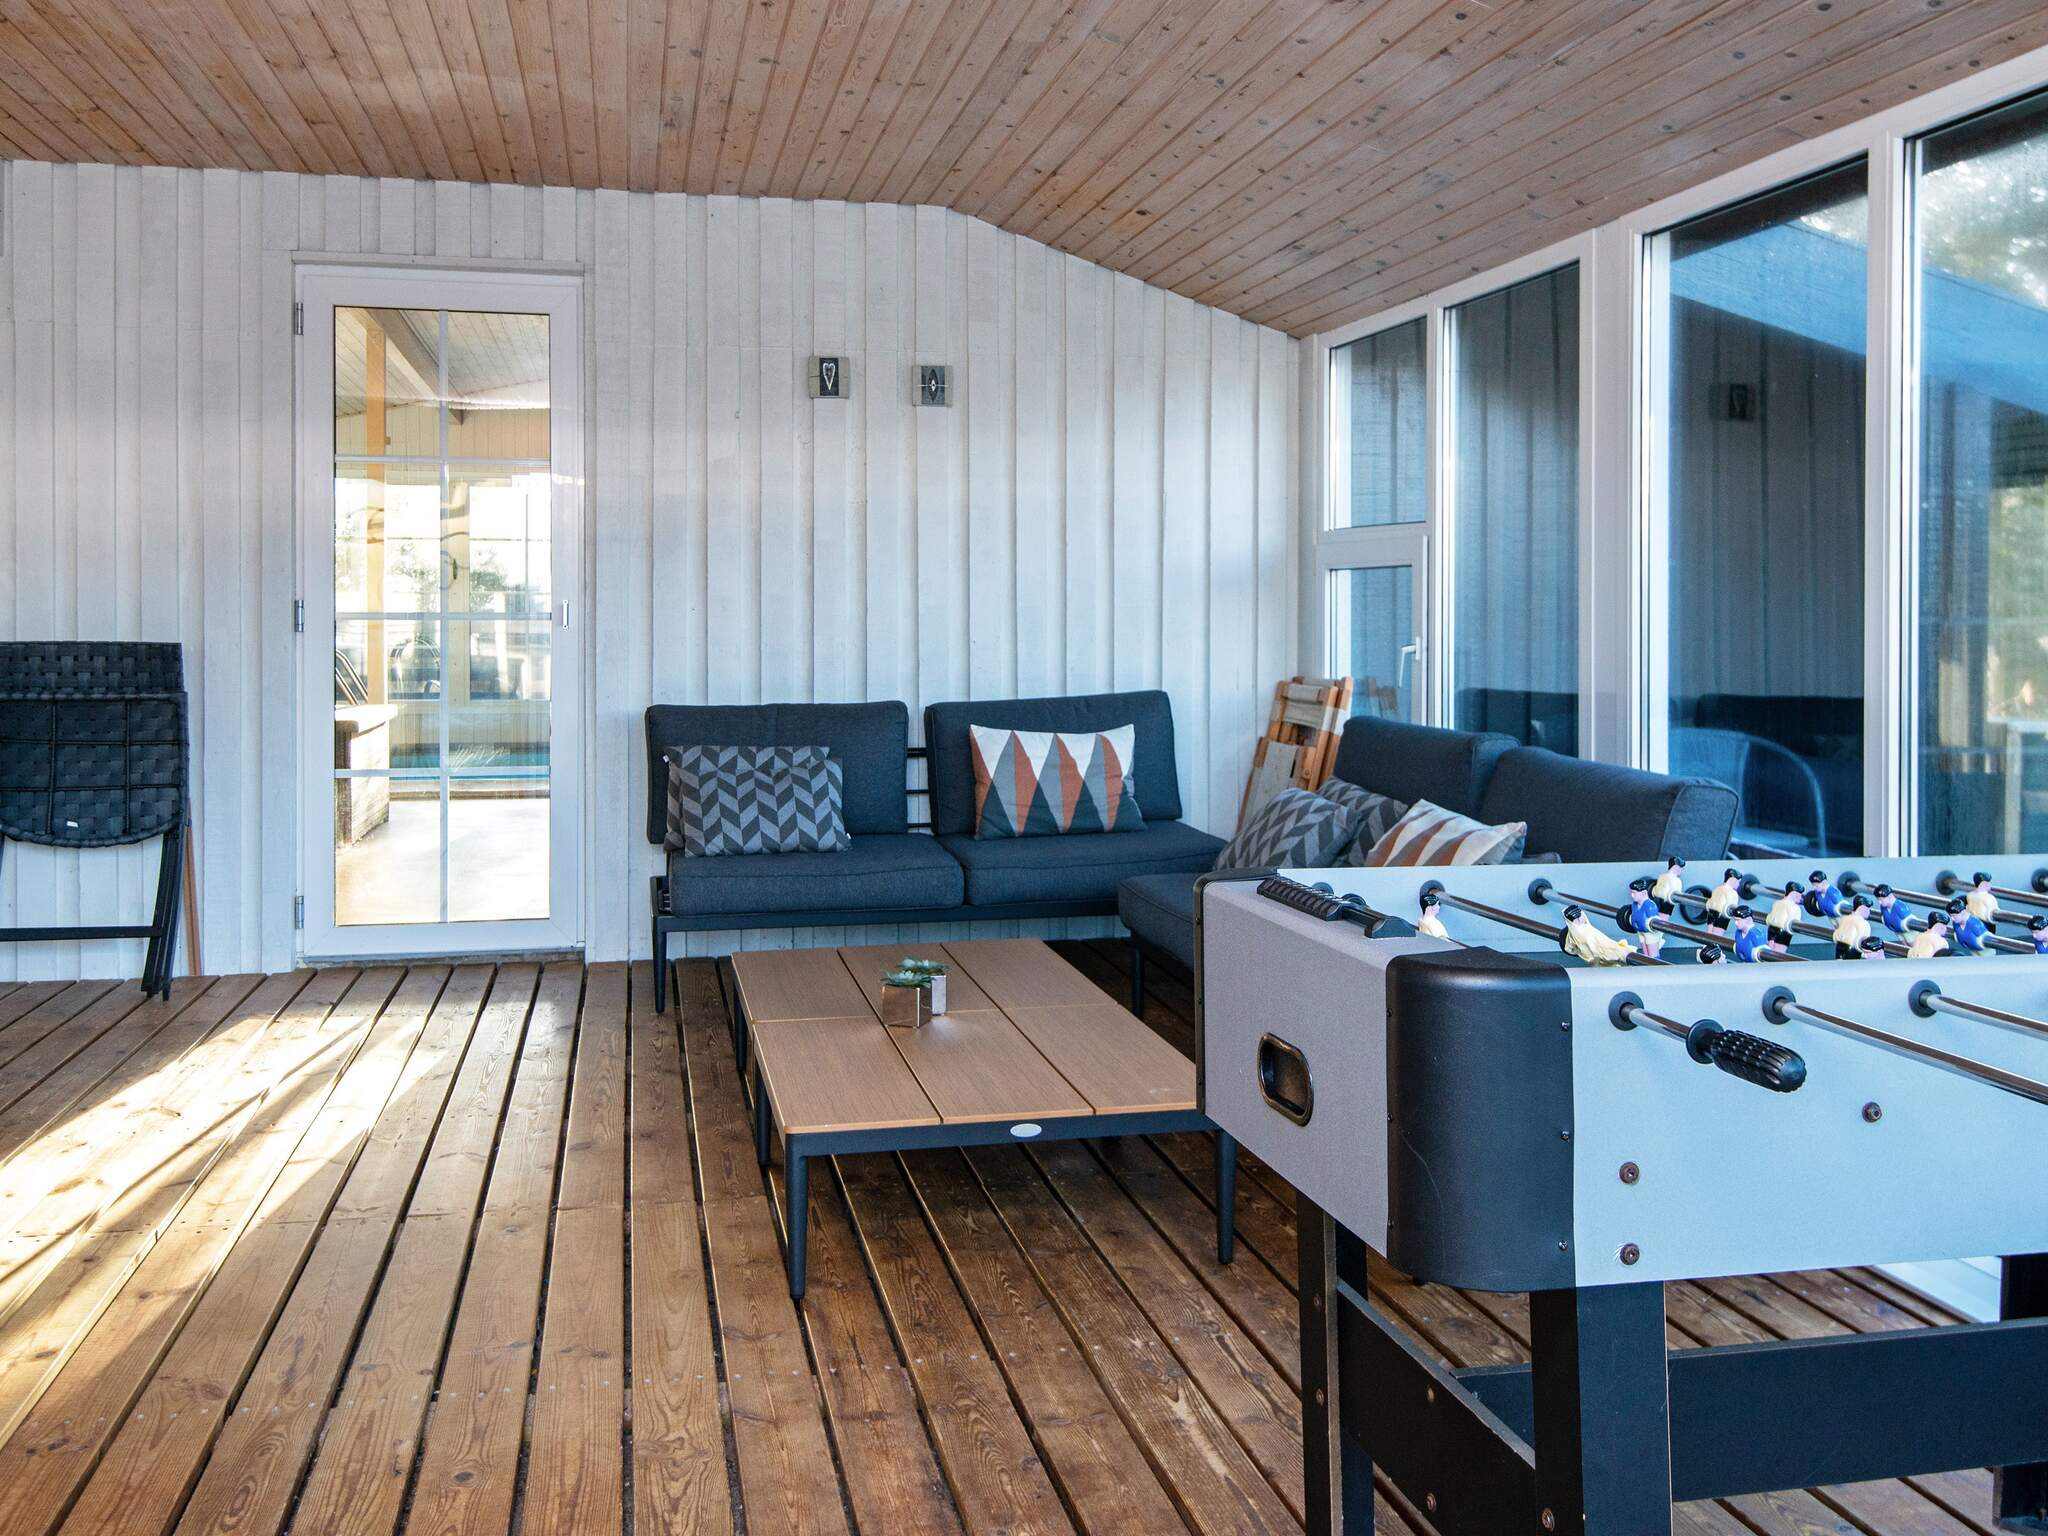 Ferienhaus Klegod (93277), Klegod, , Westjütland, Dänemark, Bild 9